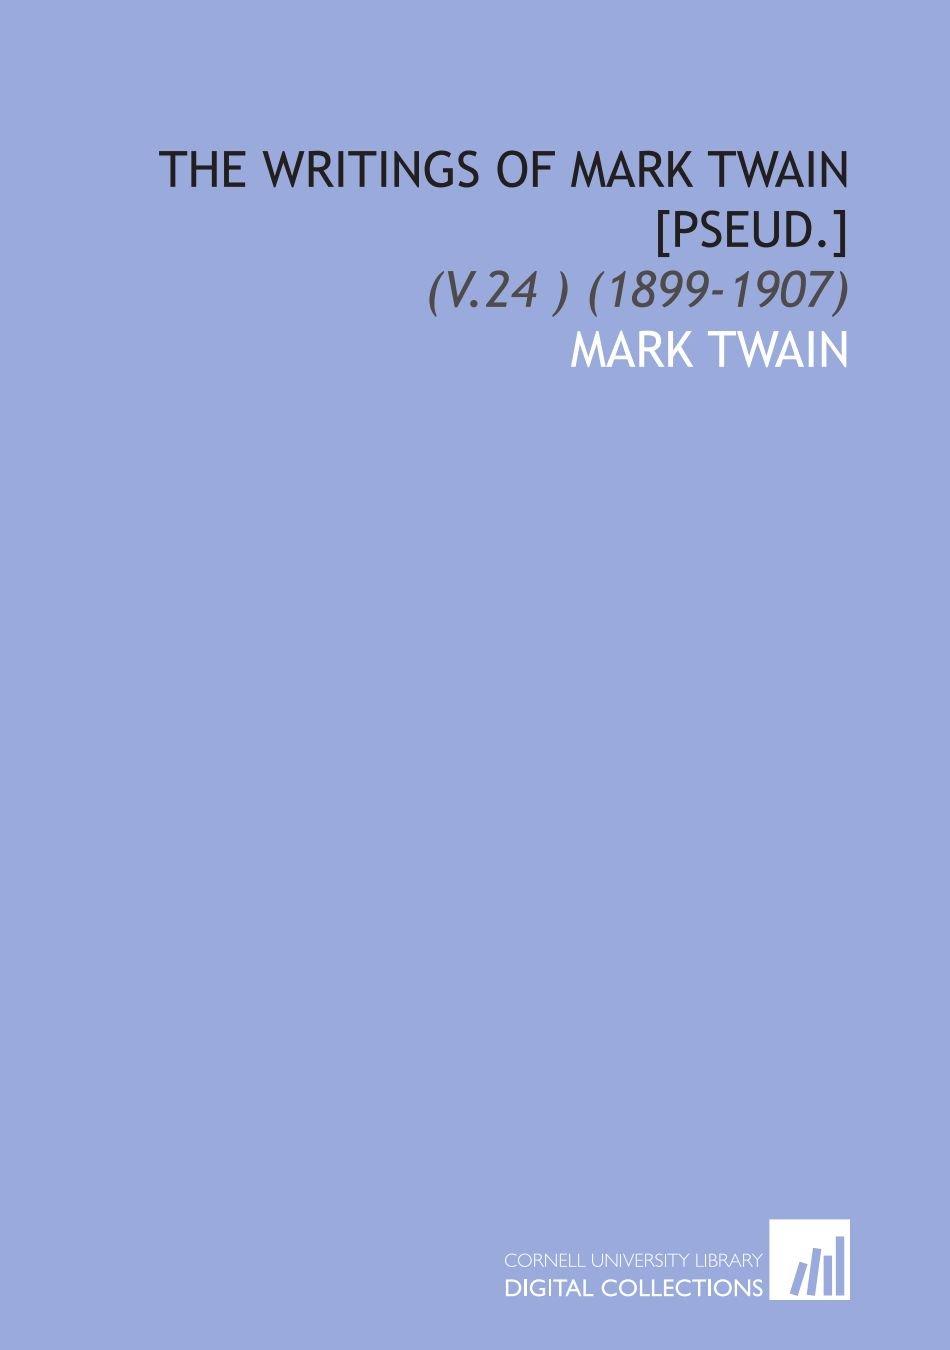 The Writings of Mark Twain [Pseud.]: (V.24 ) (1899-1907) PDF